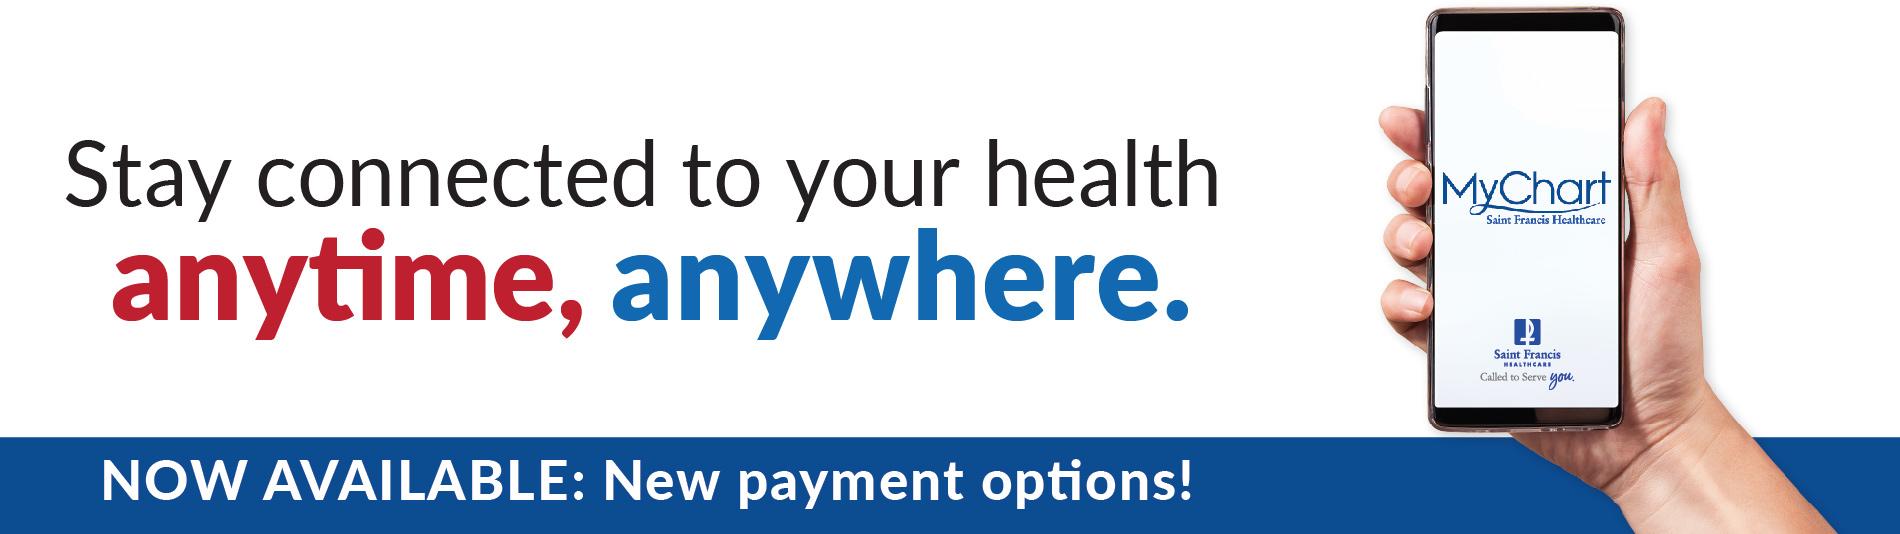 Saint Francis Healthcare System Southeast Missouri / St